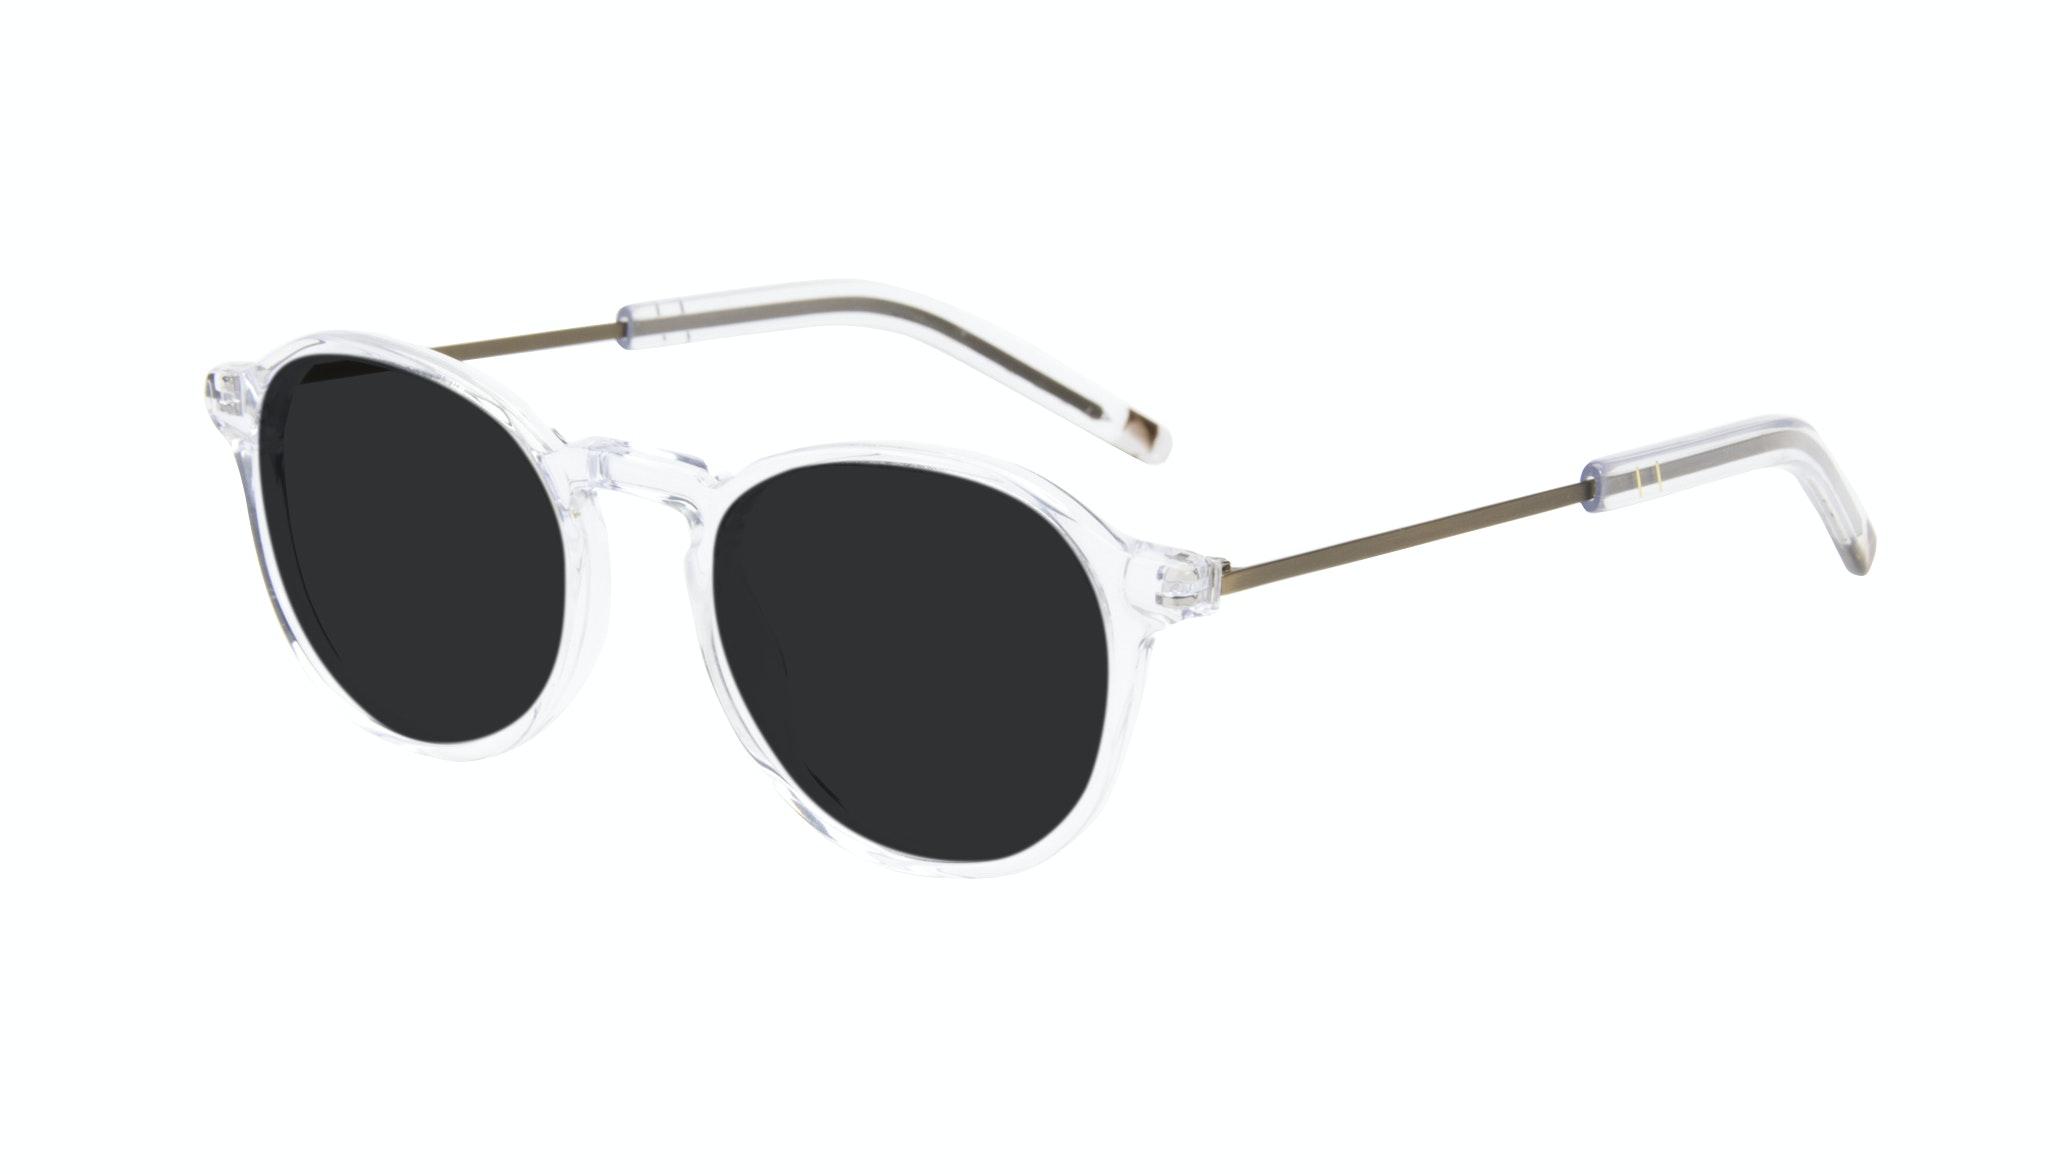 Affordable Fashion Glasses Round Sunglasses Men Prime Clear Tilt